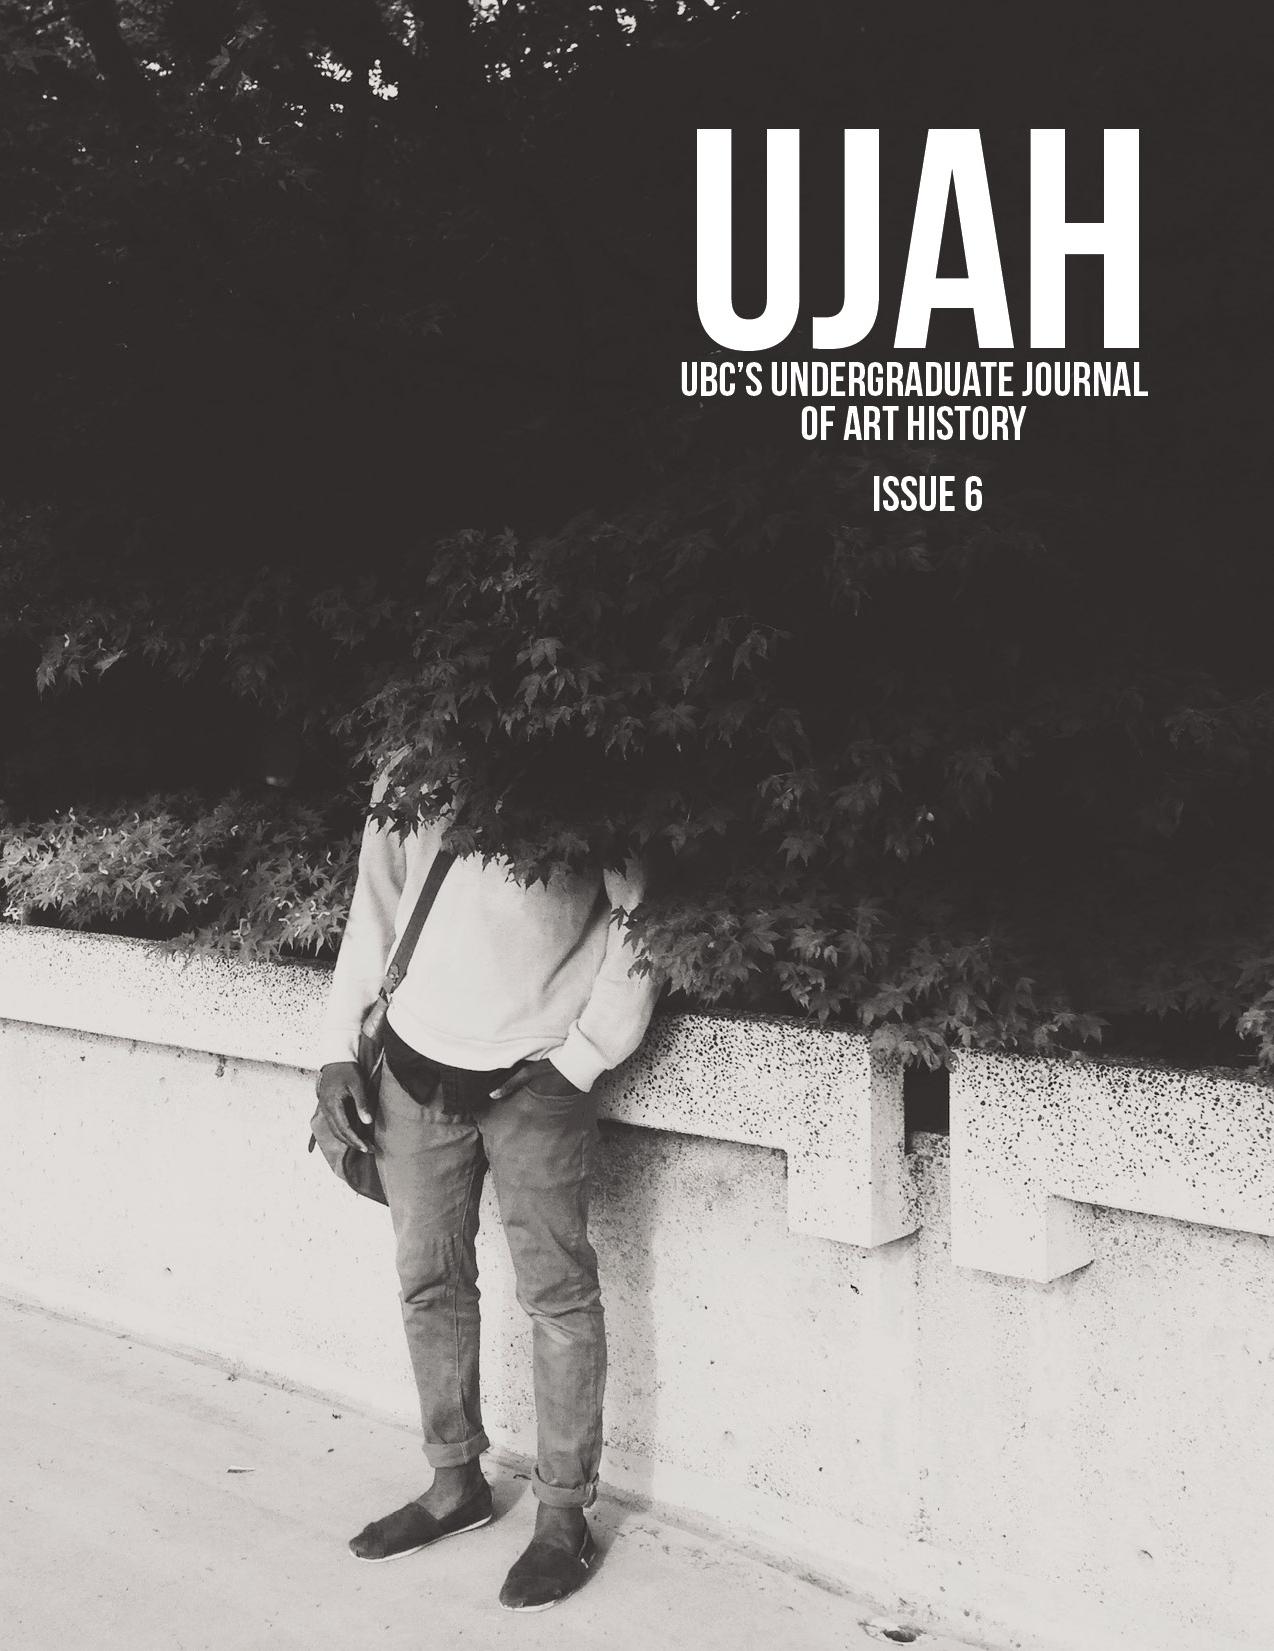 UJAH_Cover_JOL_Mar10 frontcover2copy.jpg